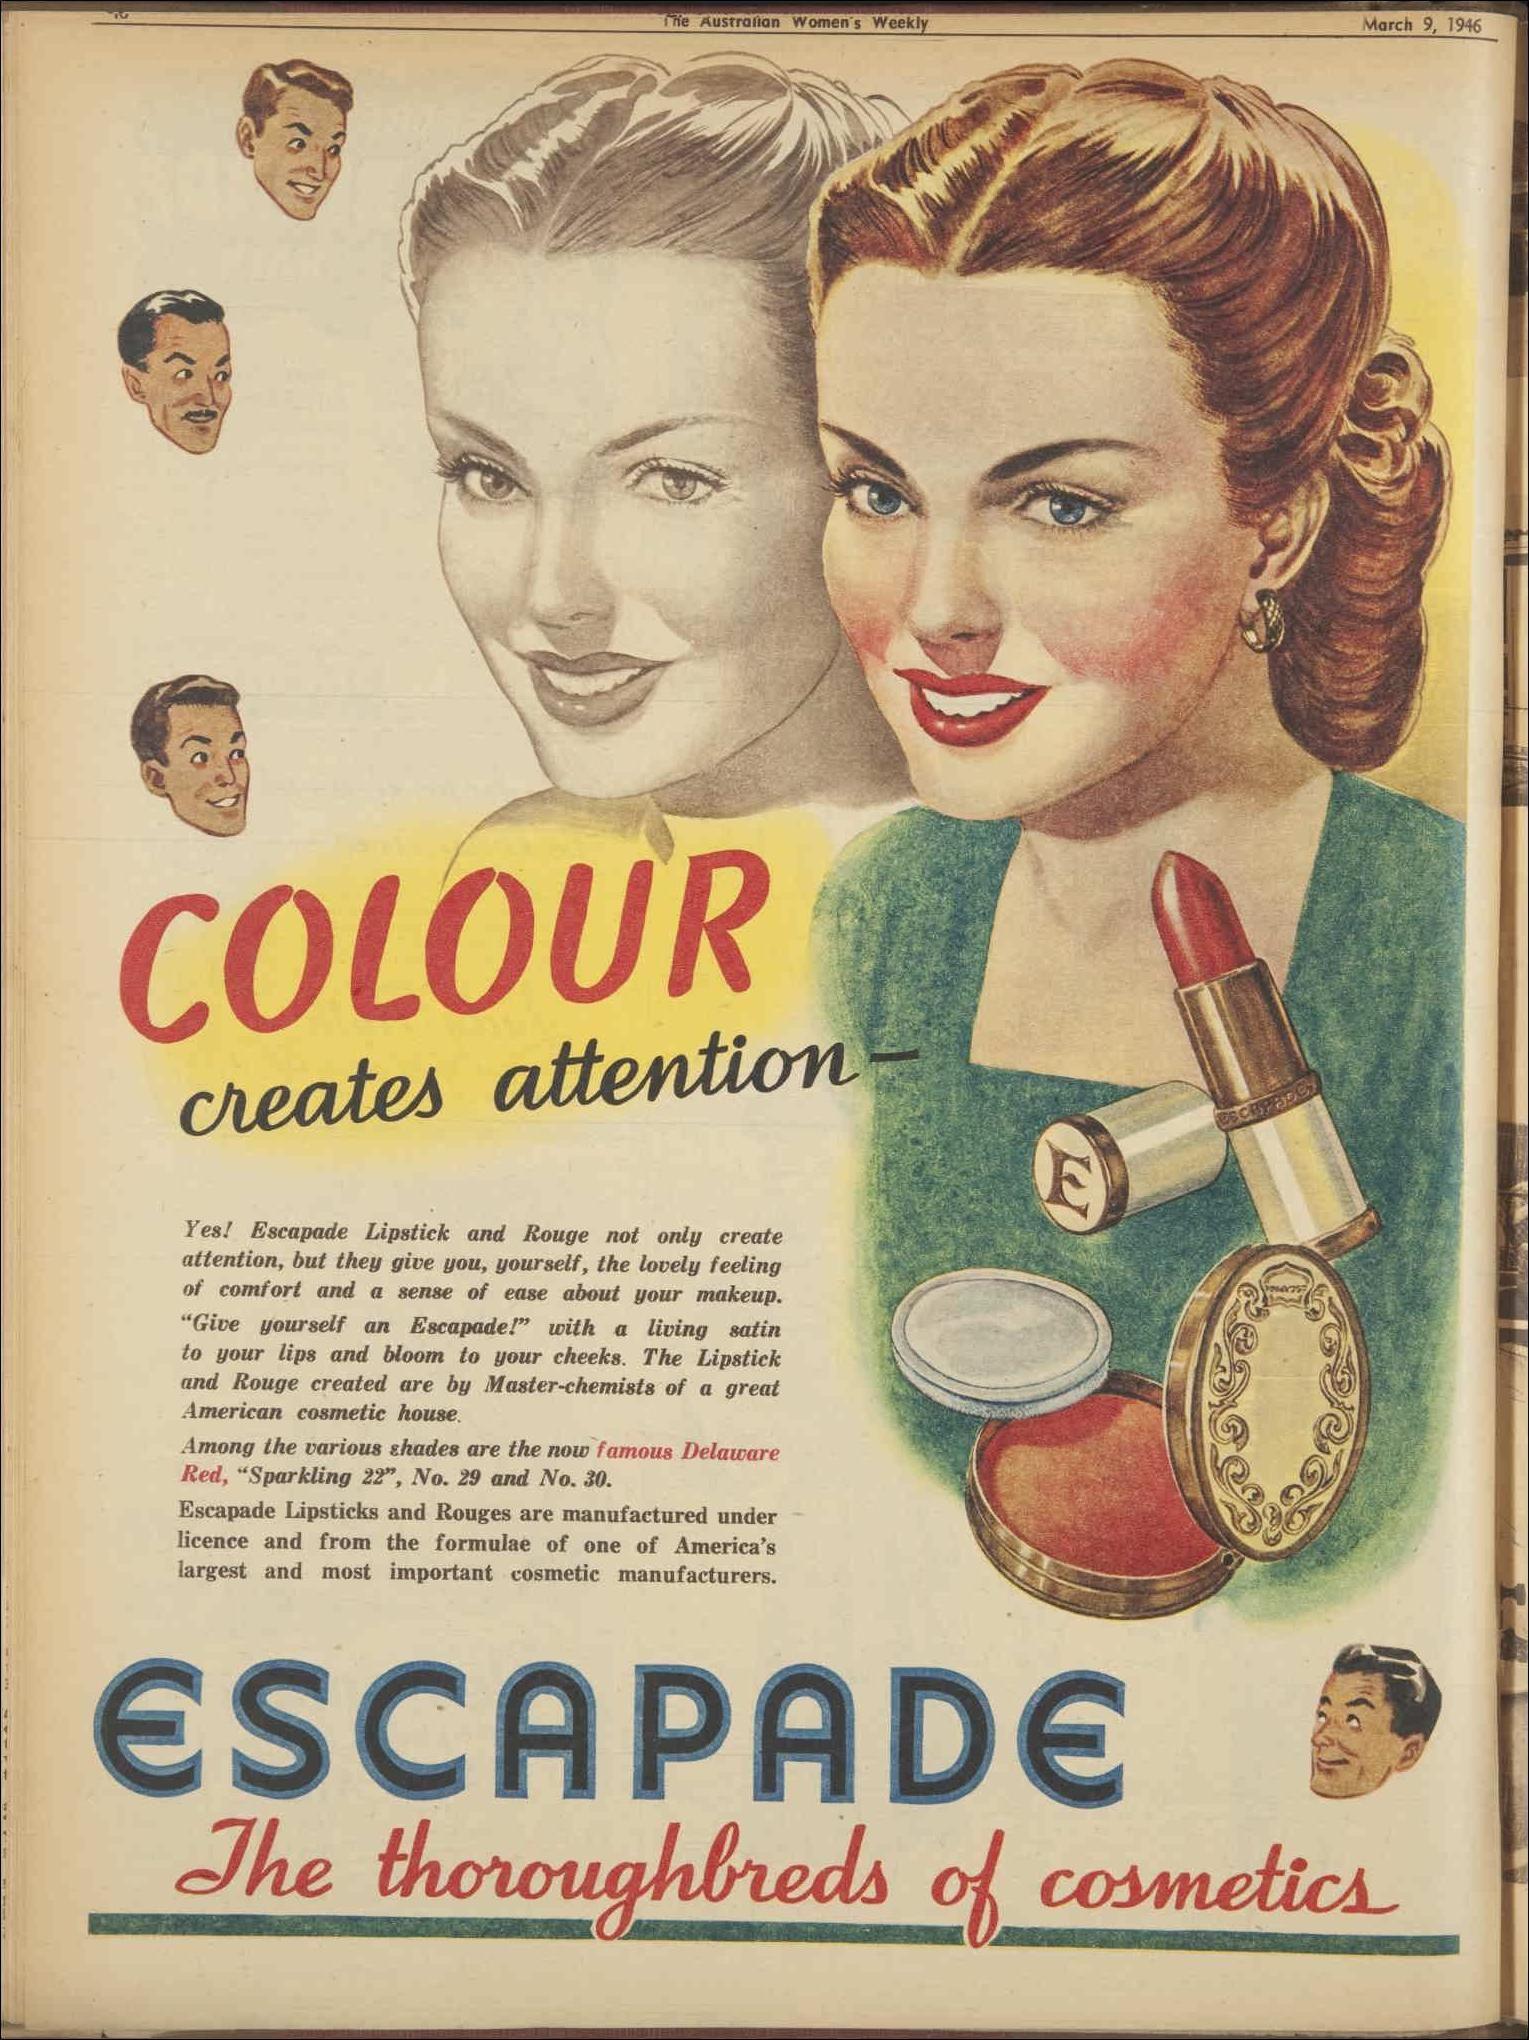 Pin on Vintage Beauty